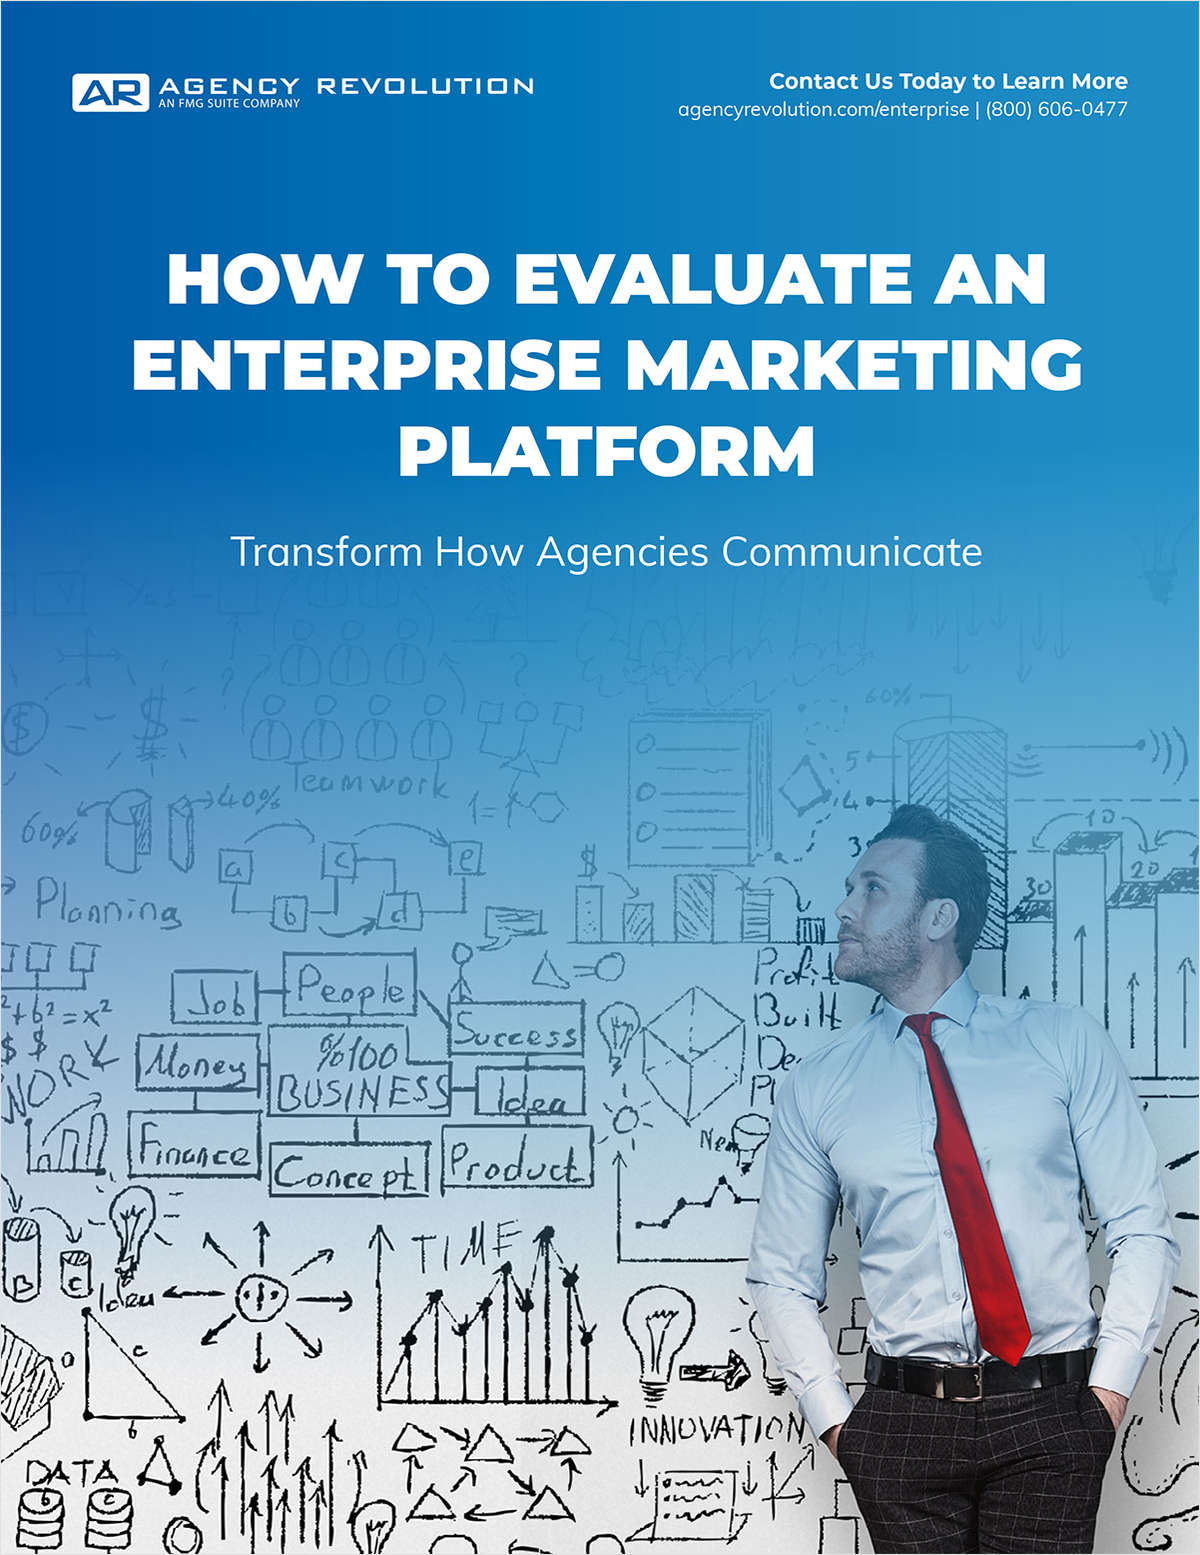 How to Evaluate an Enterprise Marketing Platform